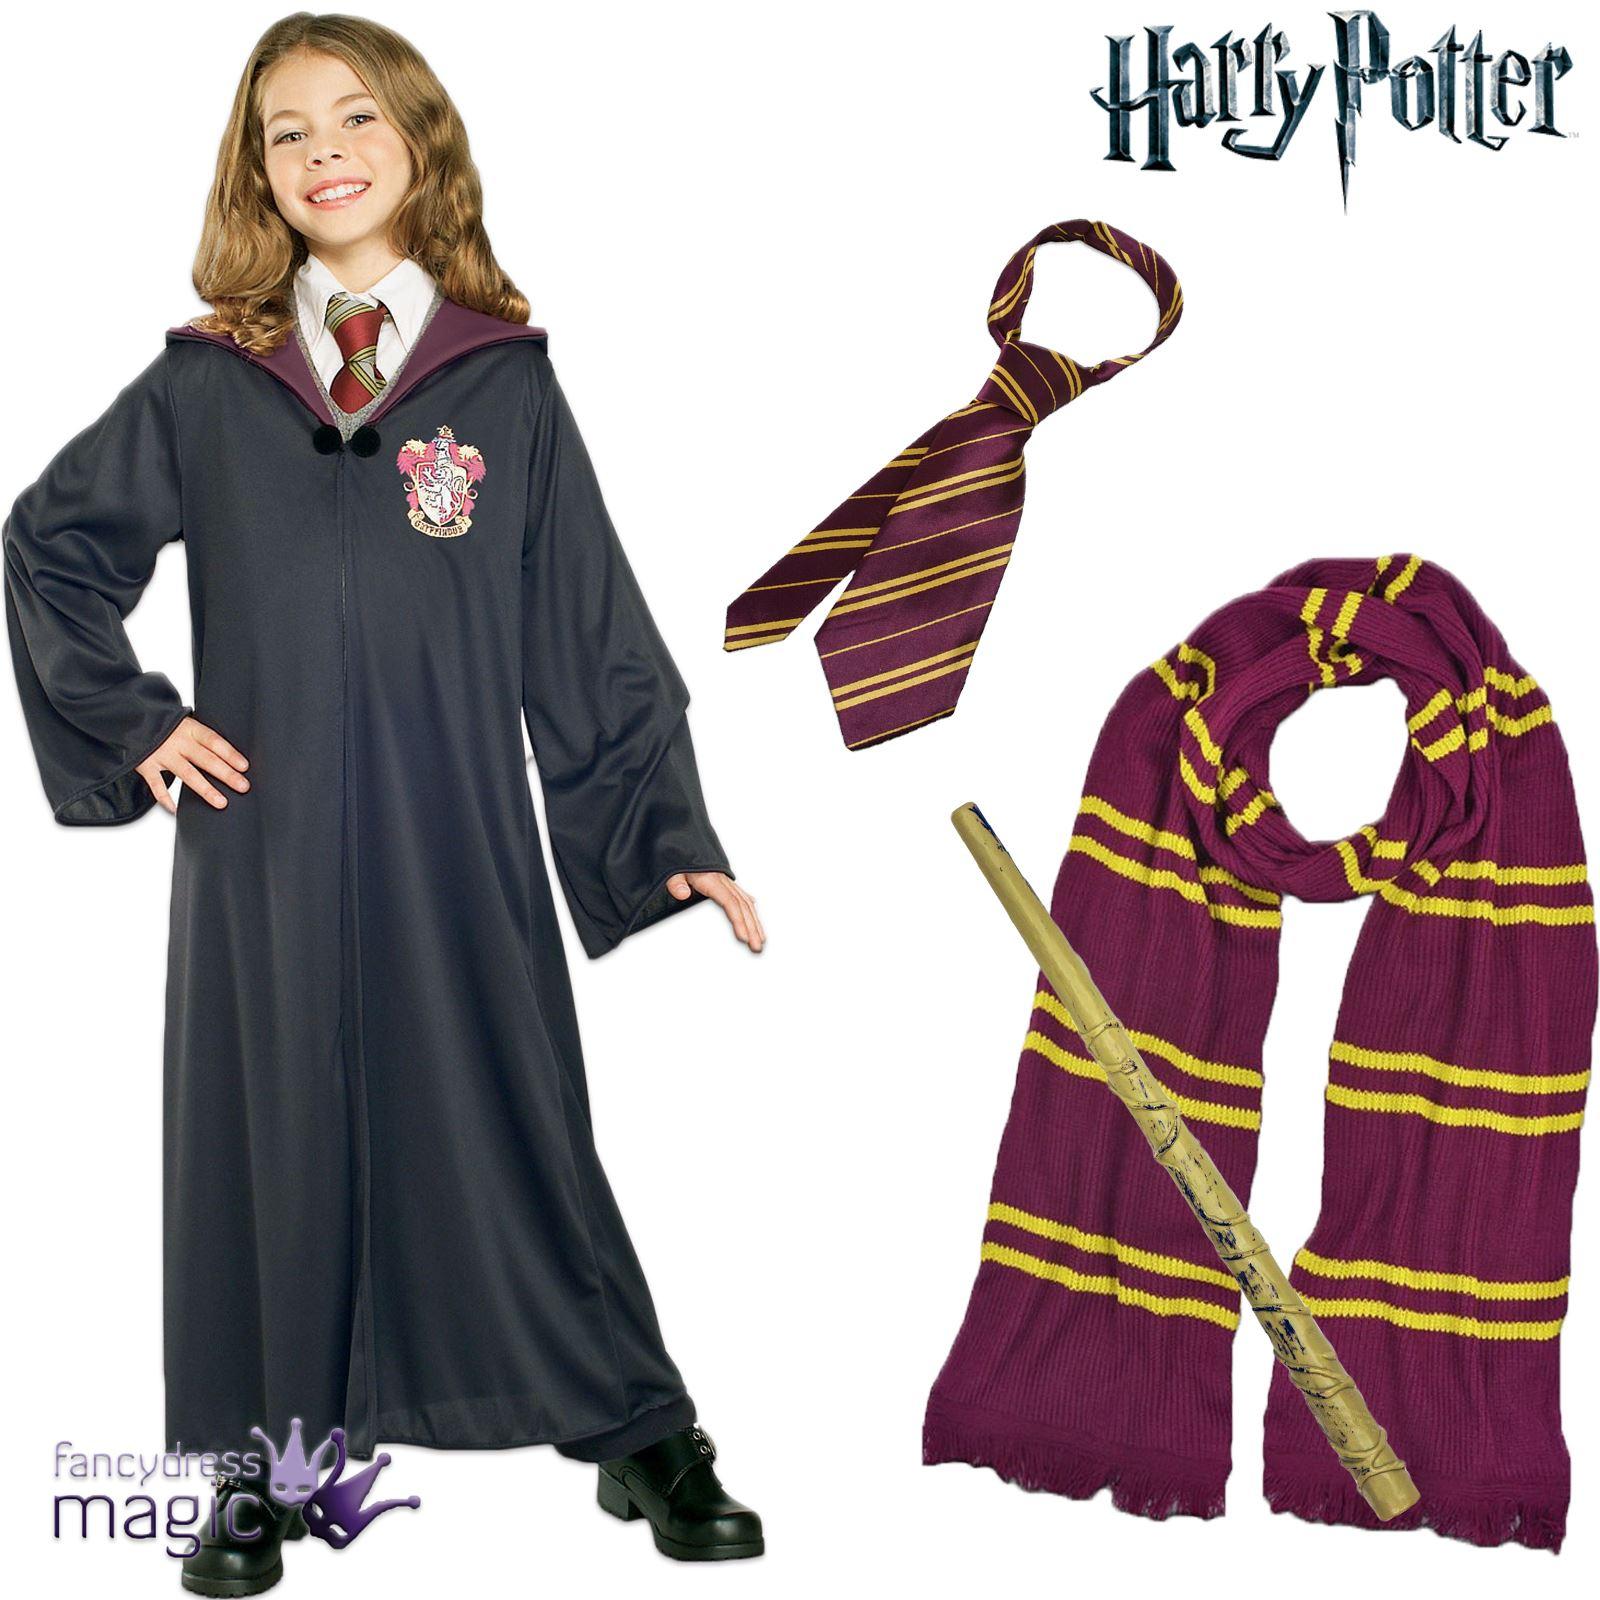 officiel harry potter hermione livre jour d guisement halloween wand lot ebay. Black Bedroom Furniture Sets. Home Design Ideas